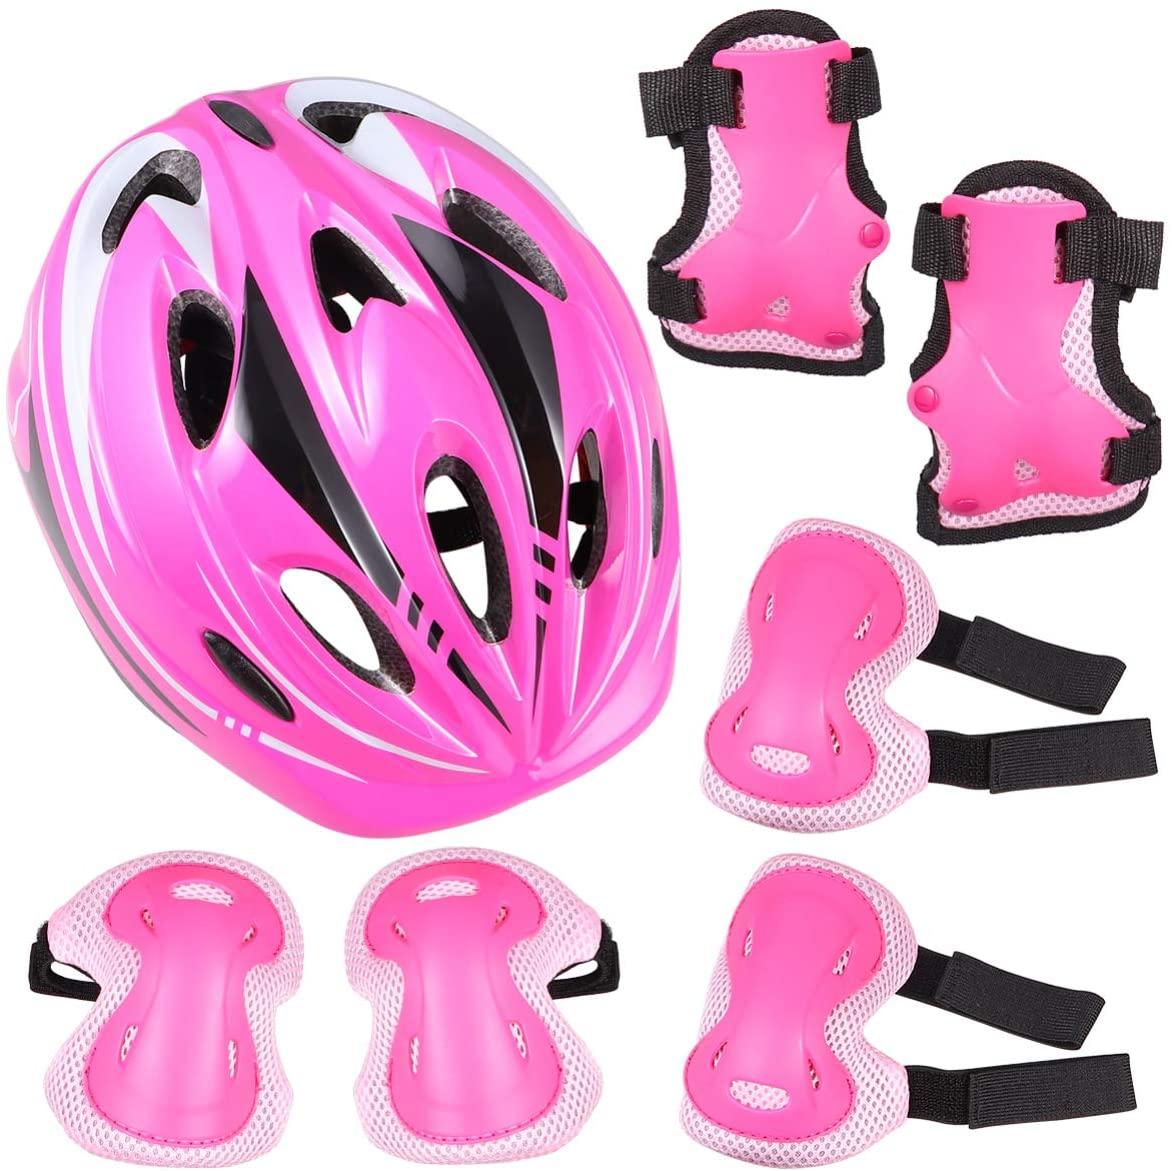 BESPORTBLE 7pcs Kids Bike Helmet Sport Protective Gear Set Knee Pads Elbow Pads Wrist Guards Skateboard Helmet Set for Boy Girl